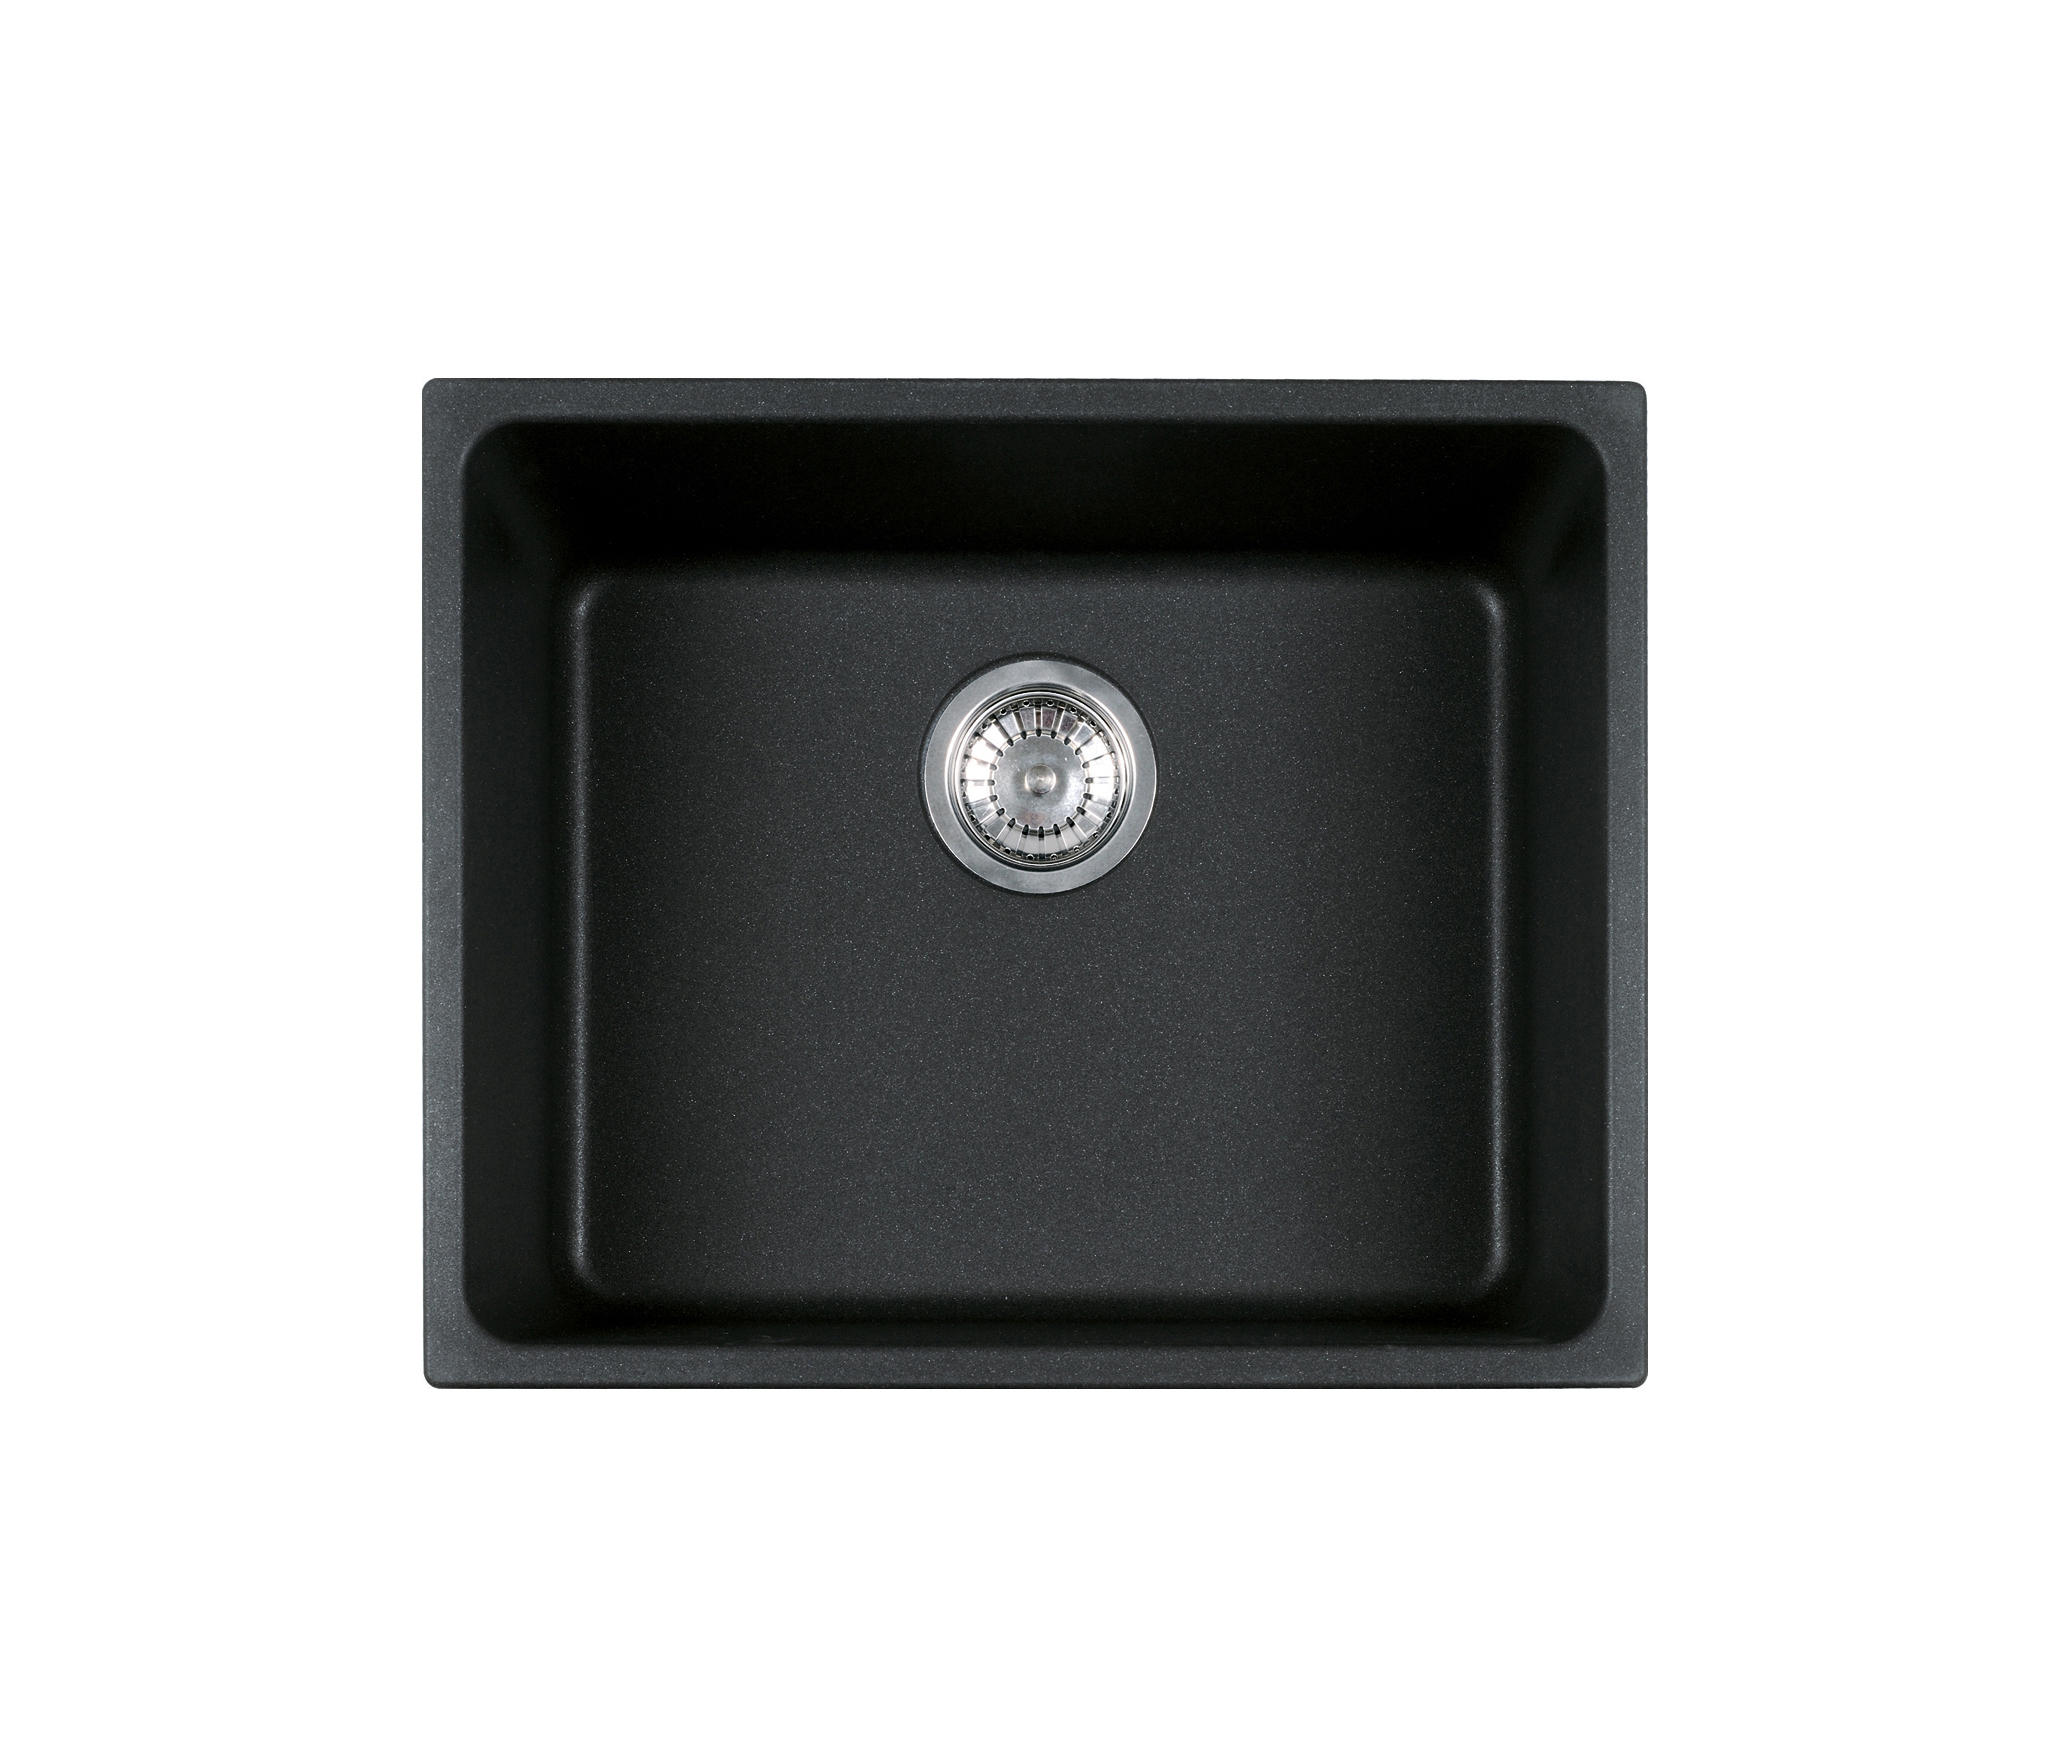 Küchenspülbecken Unterbau ~ kubus spÜle kbg 110 50 fragranit + onyx küchenspülbecken